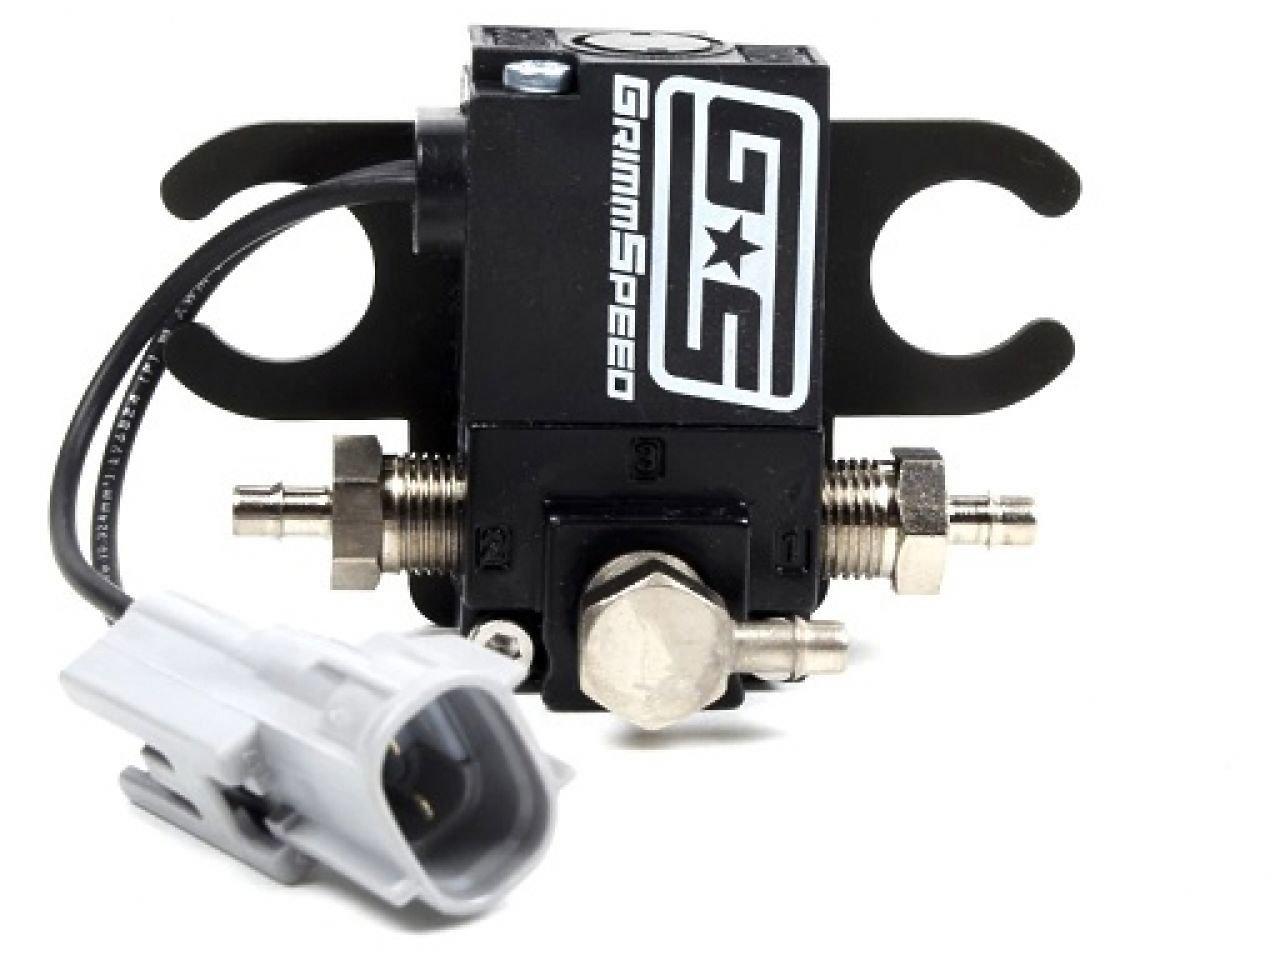 Subaru 02-05 WRX Grimmspeed Boost Control Solenoid